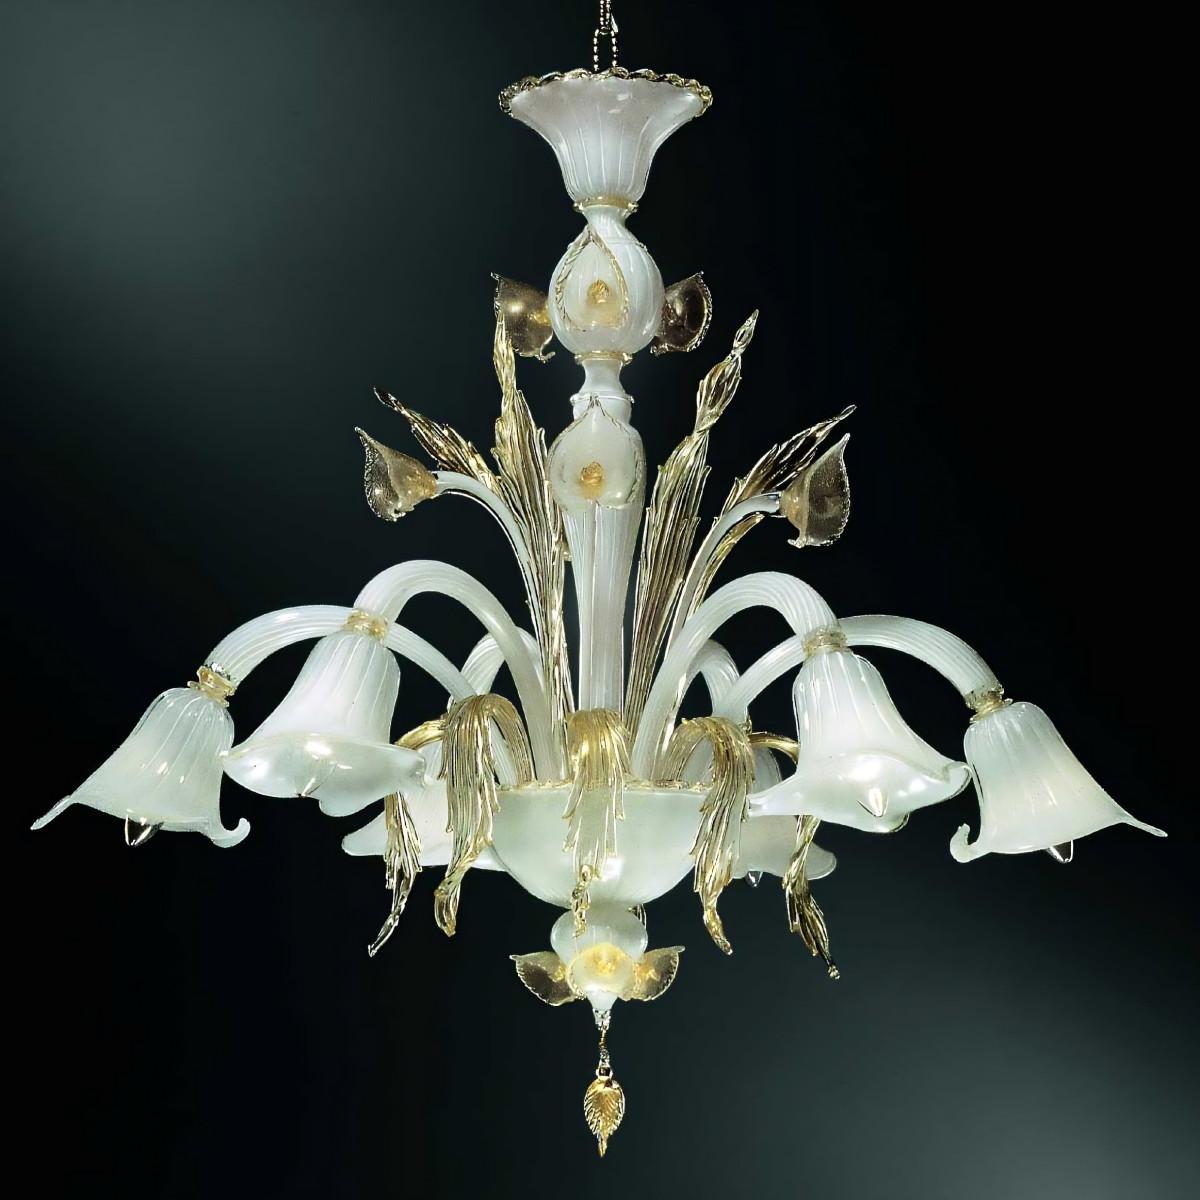 Laguna 6 lumières lustre Murano - couleur blanc or